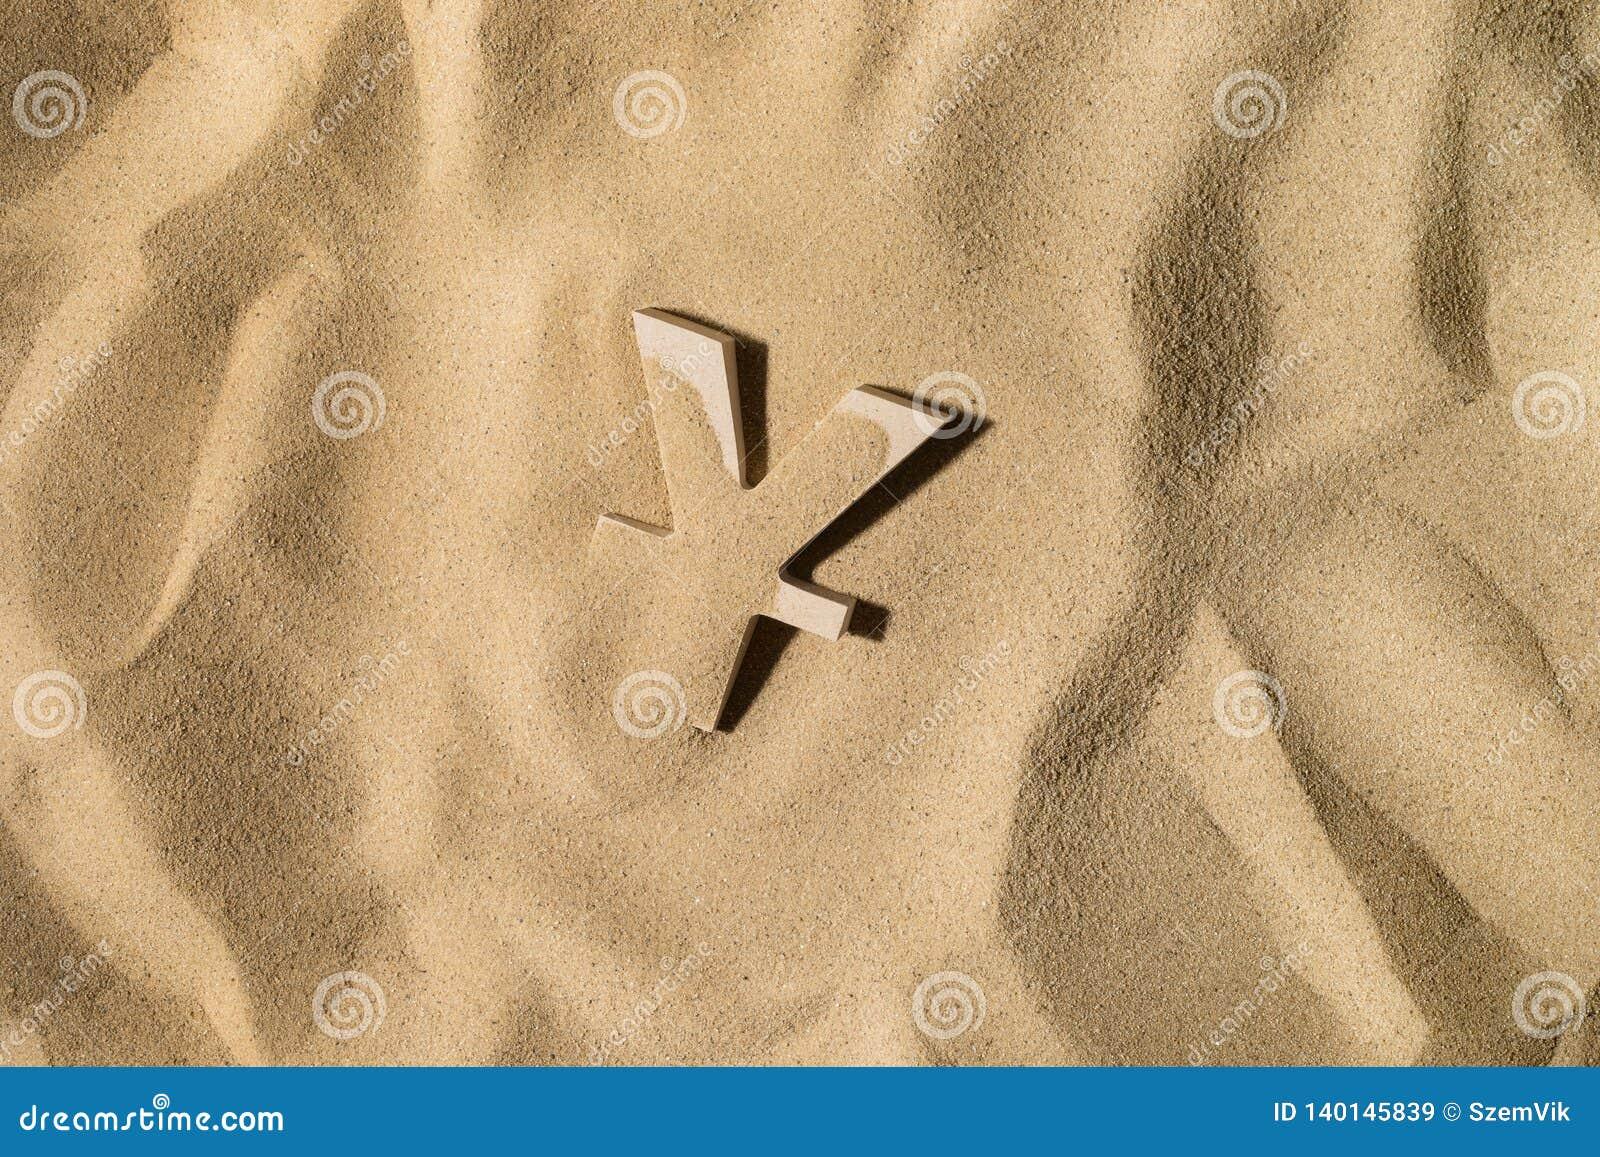 Символ иен под песком